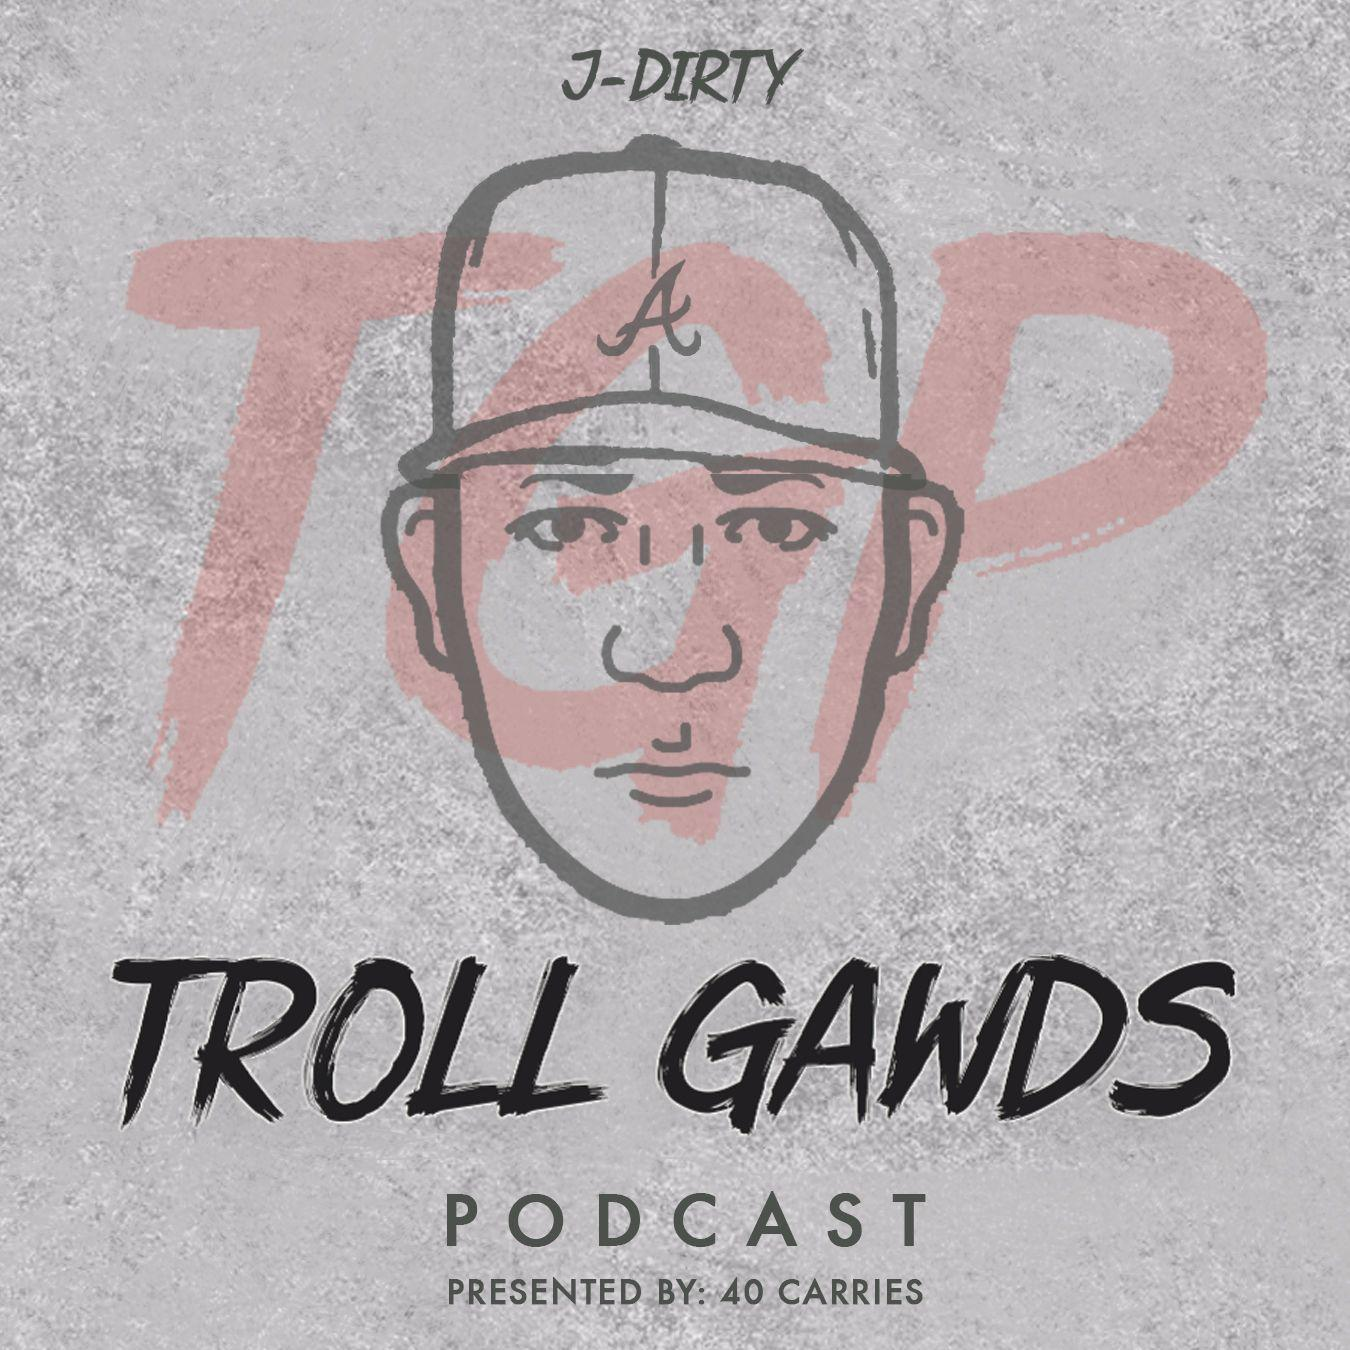 Audio Porno Troll episode 61 - future is a feminist - troll gawds (podcast